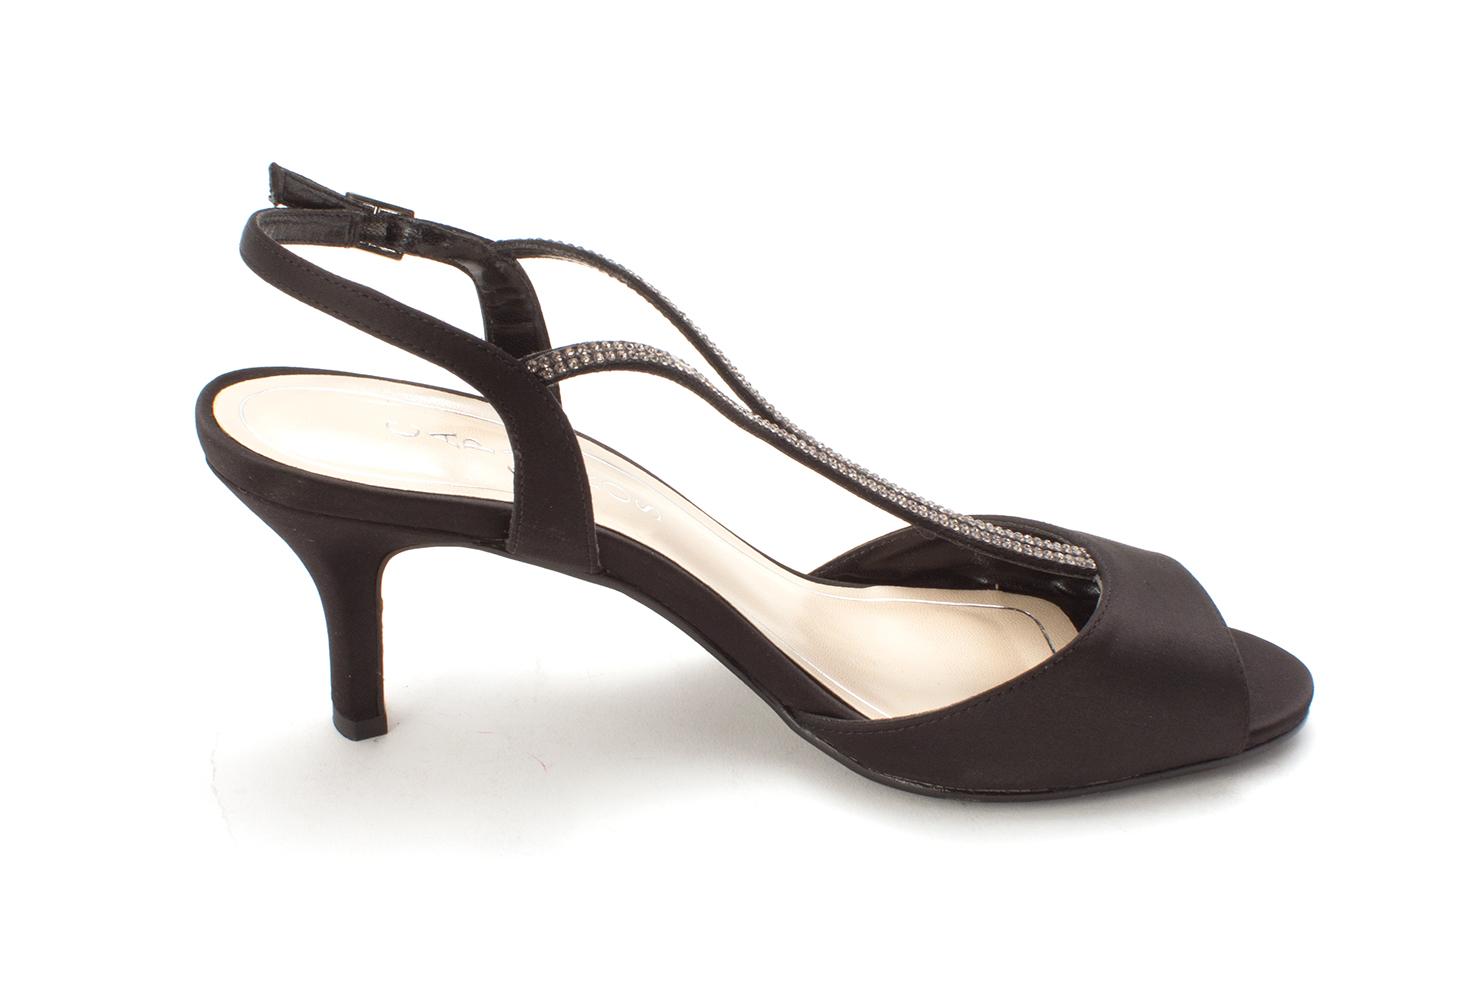 b8afb587911 Caparros Womens Delicia Open Toe Formal T-Strap Sandals